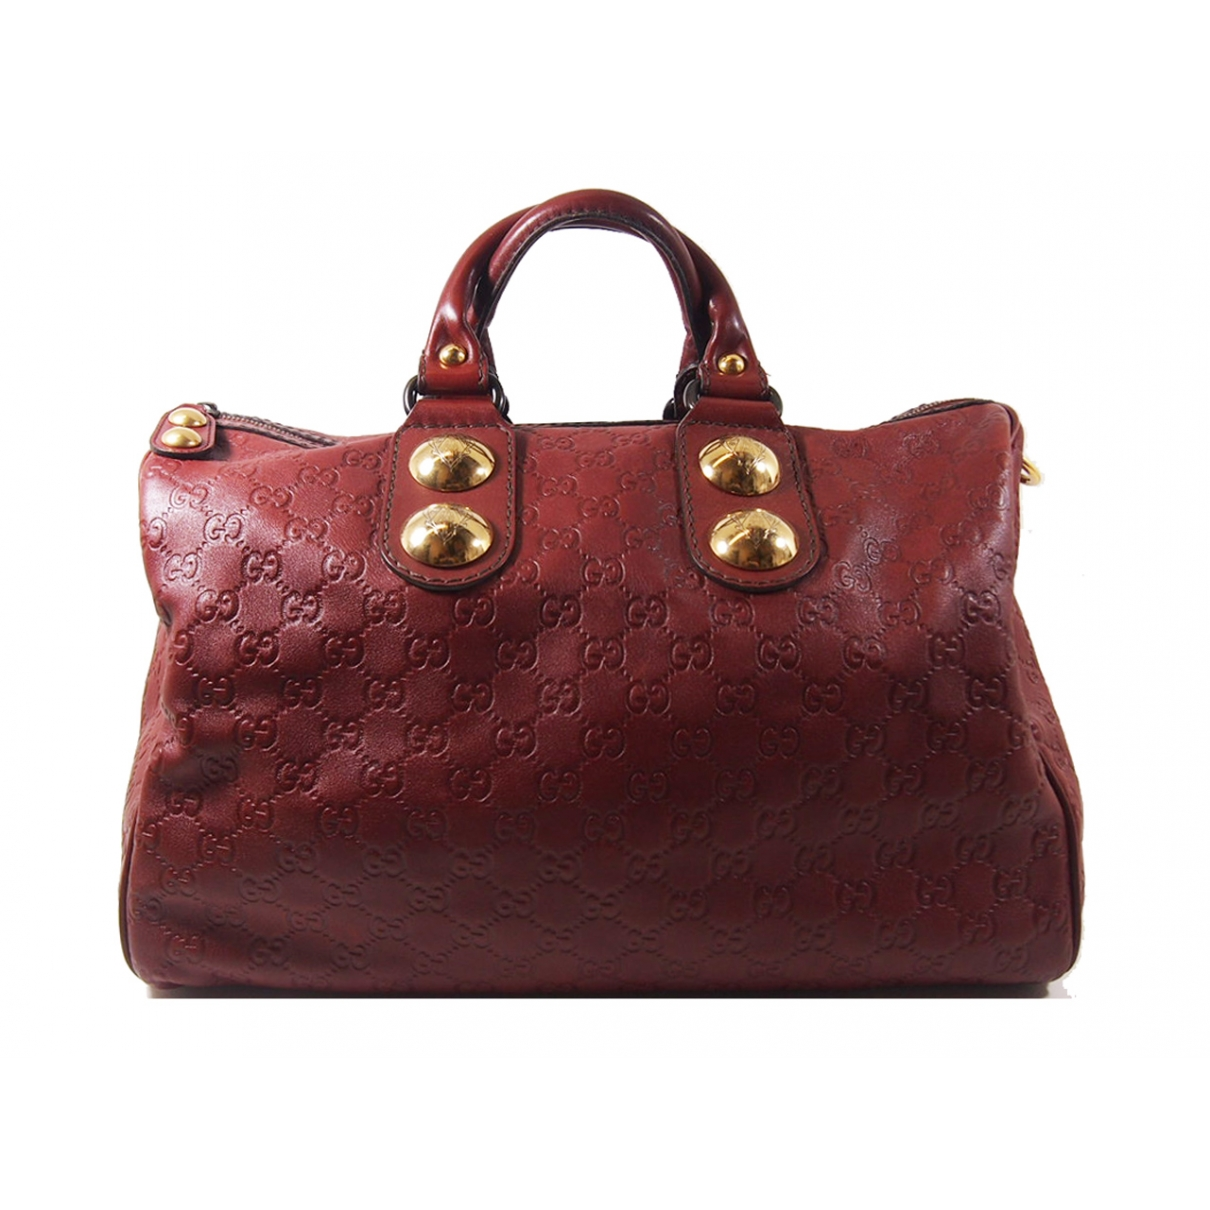 Gucci \N Handtasche in  Bordeauxrot Leder